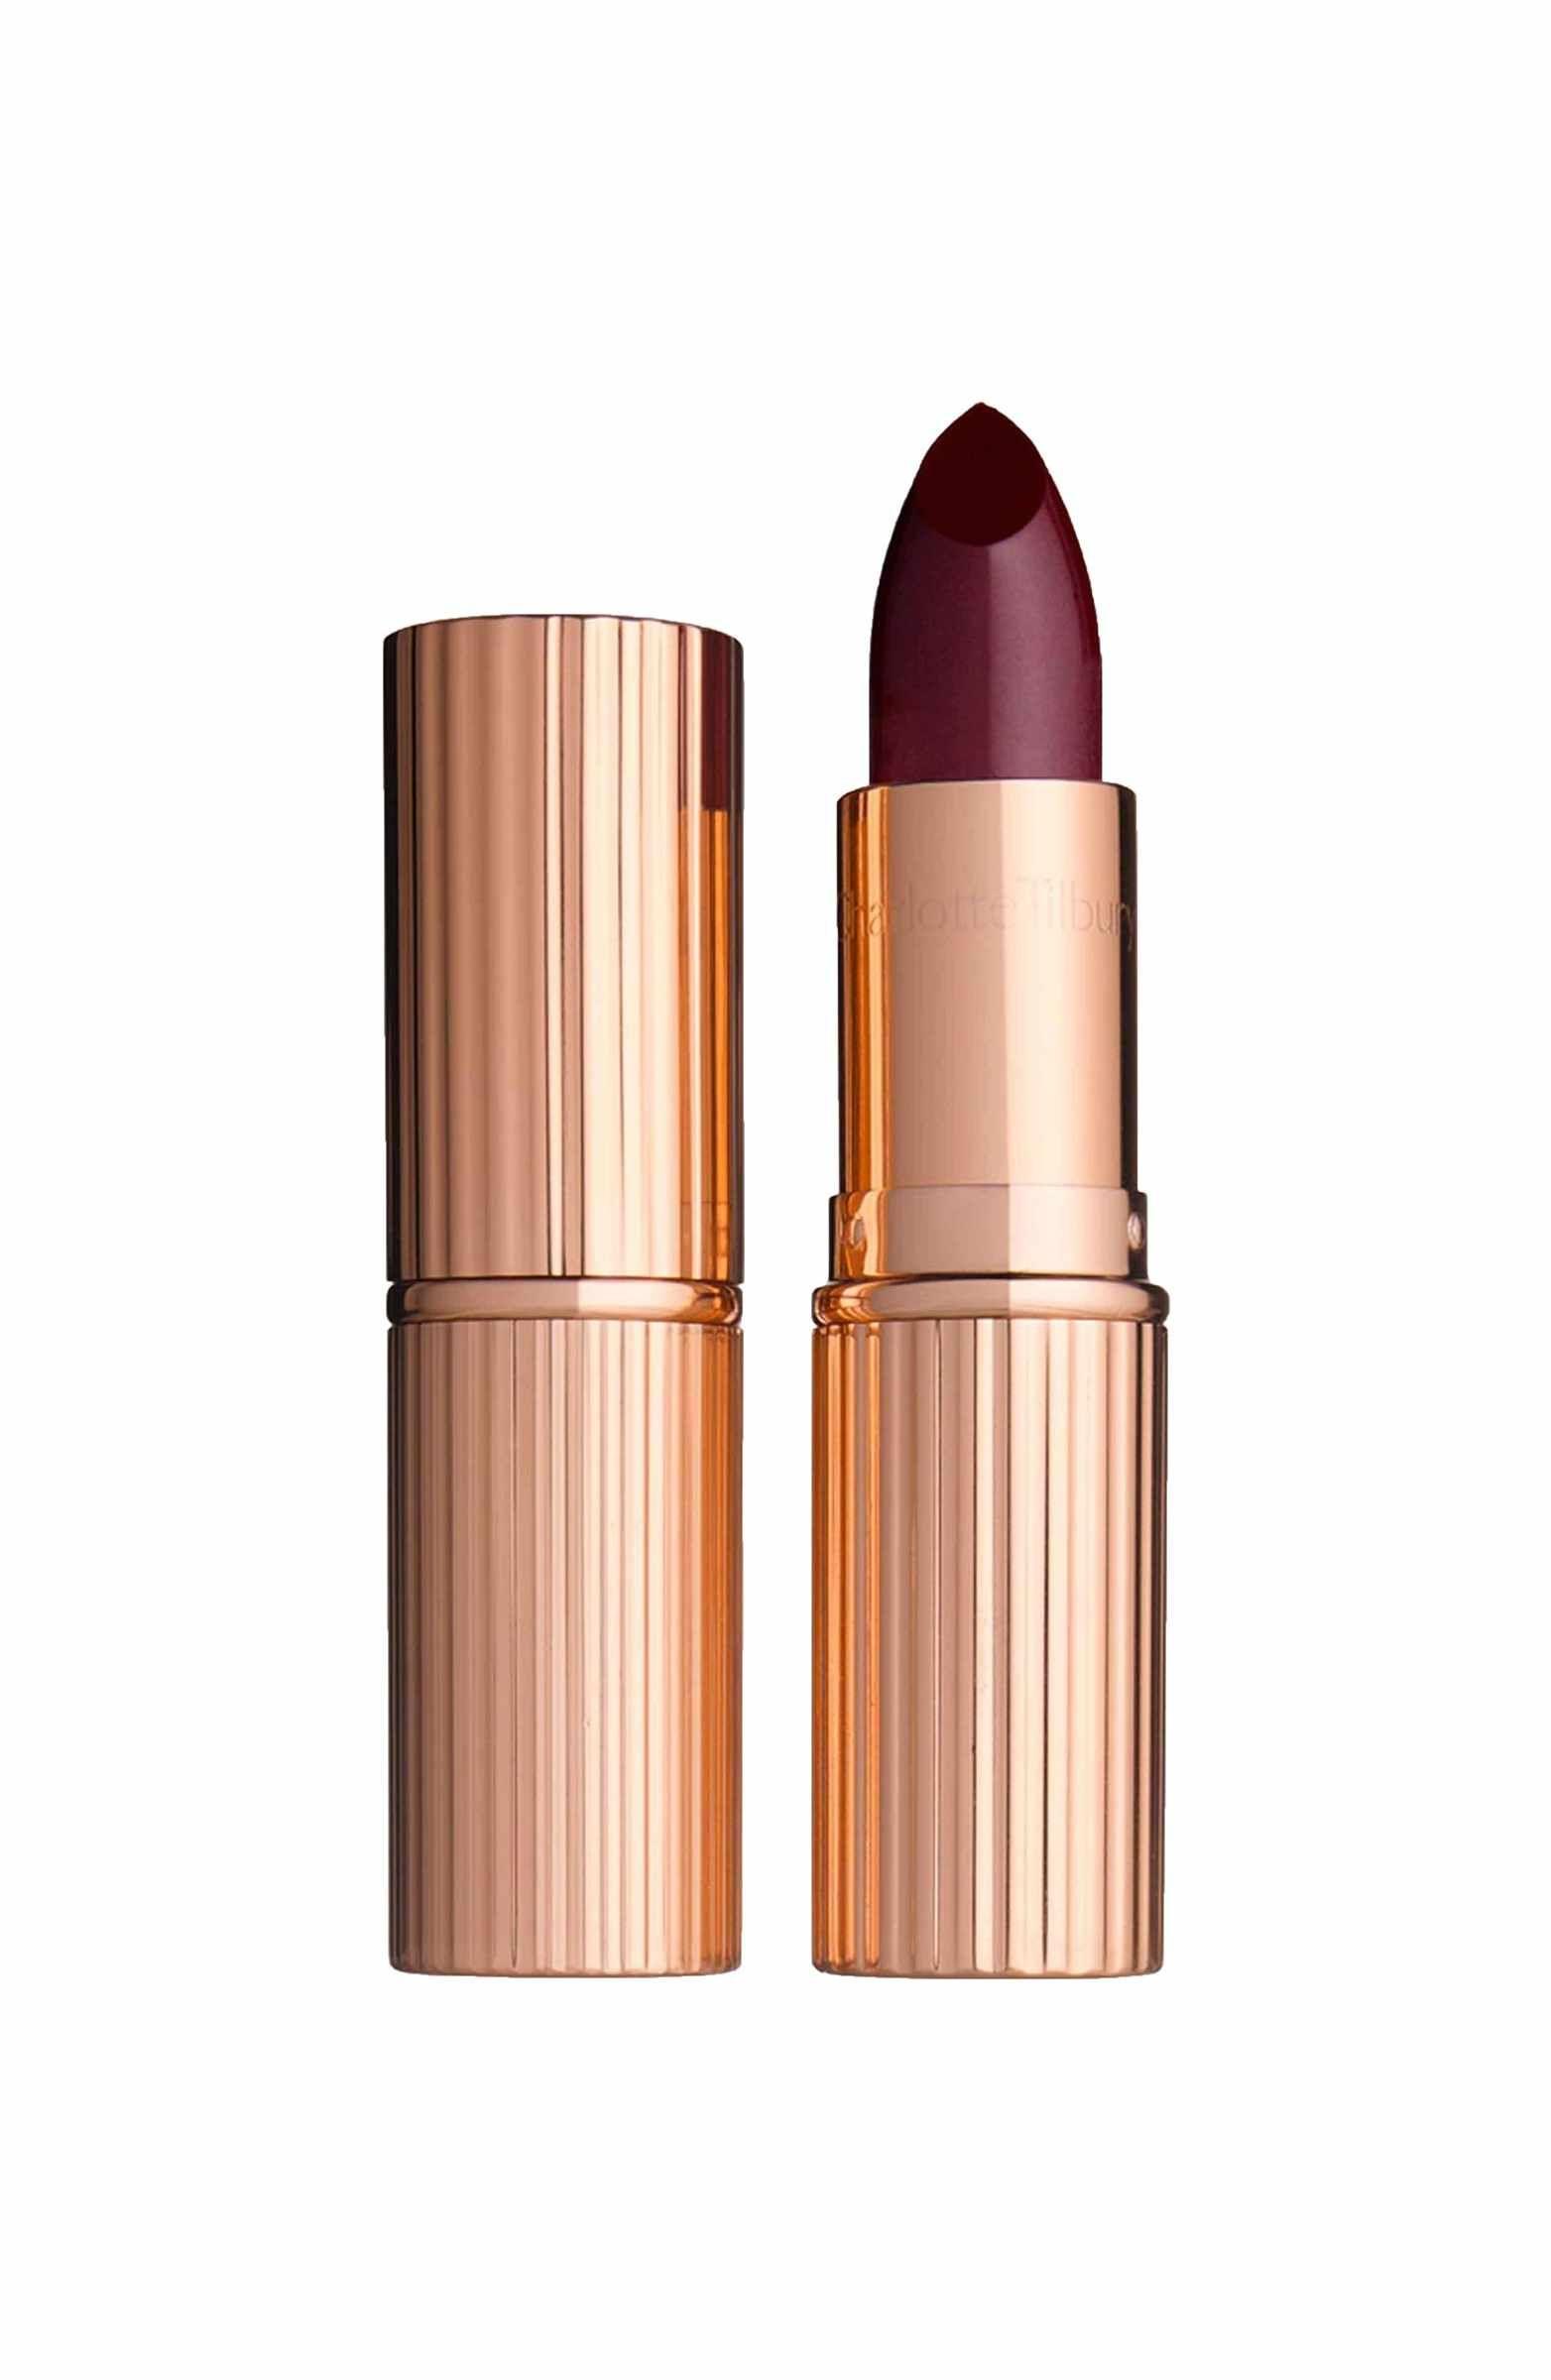 Peachy Nude - Hollywood Lips Duo | Charlotte Tilbury